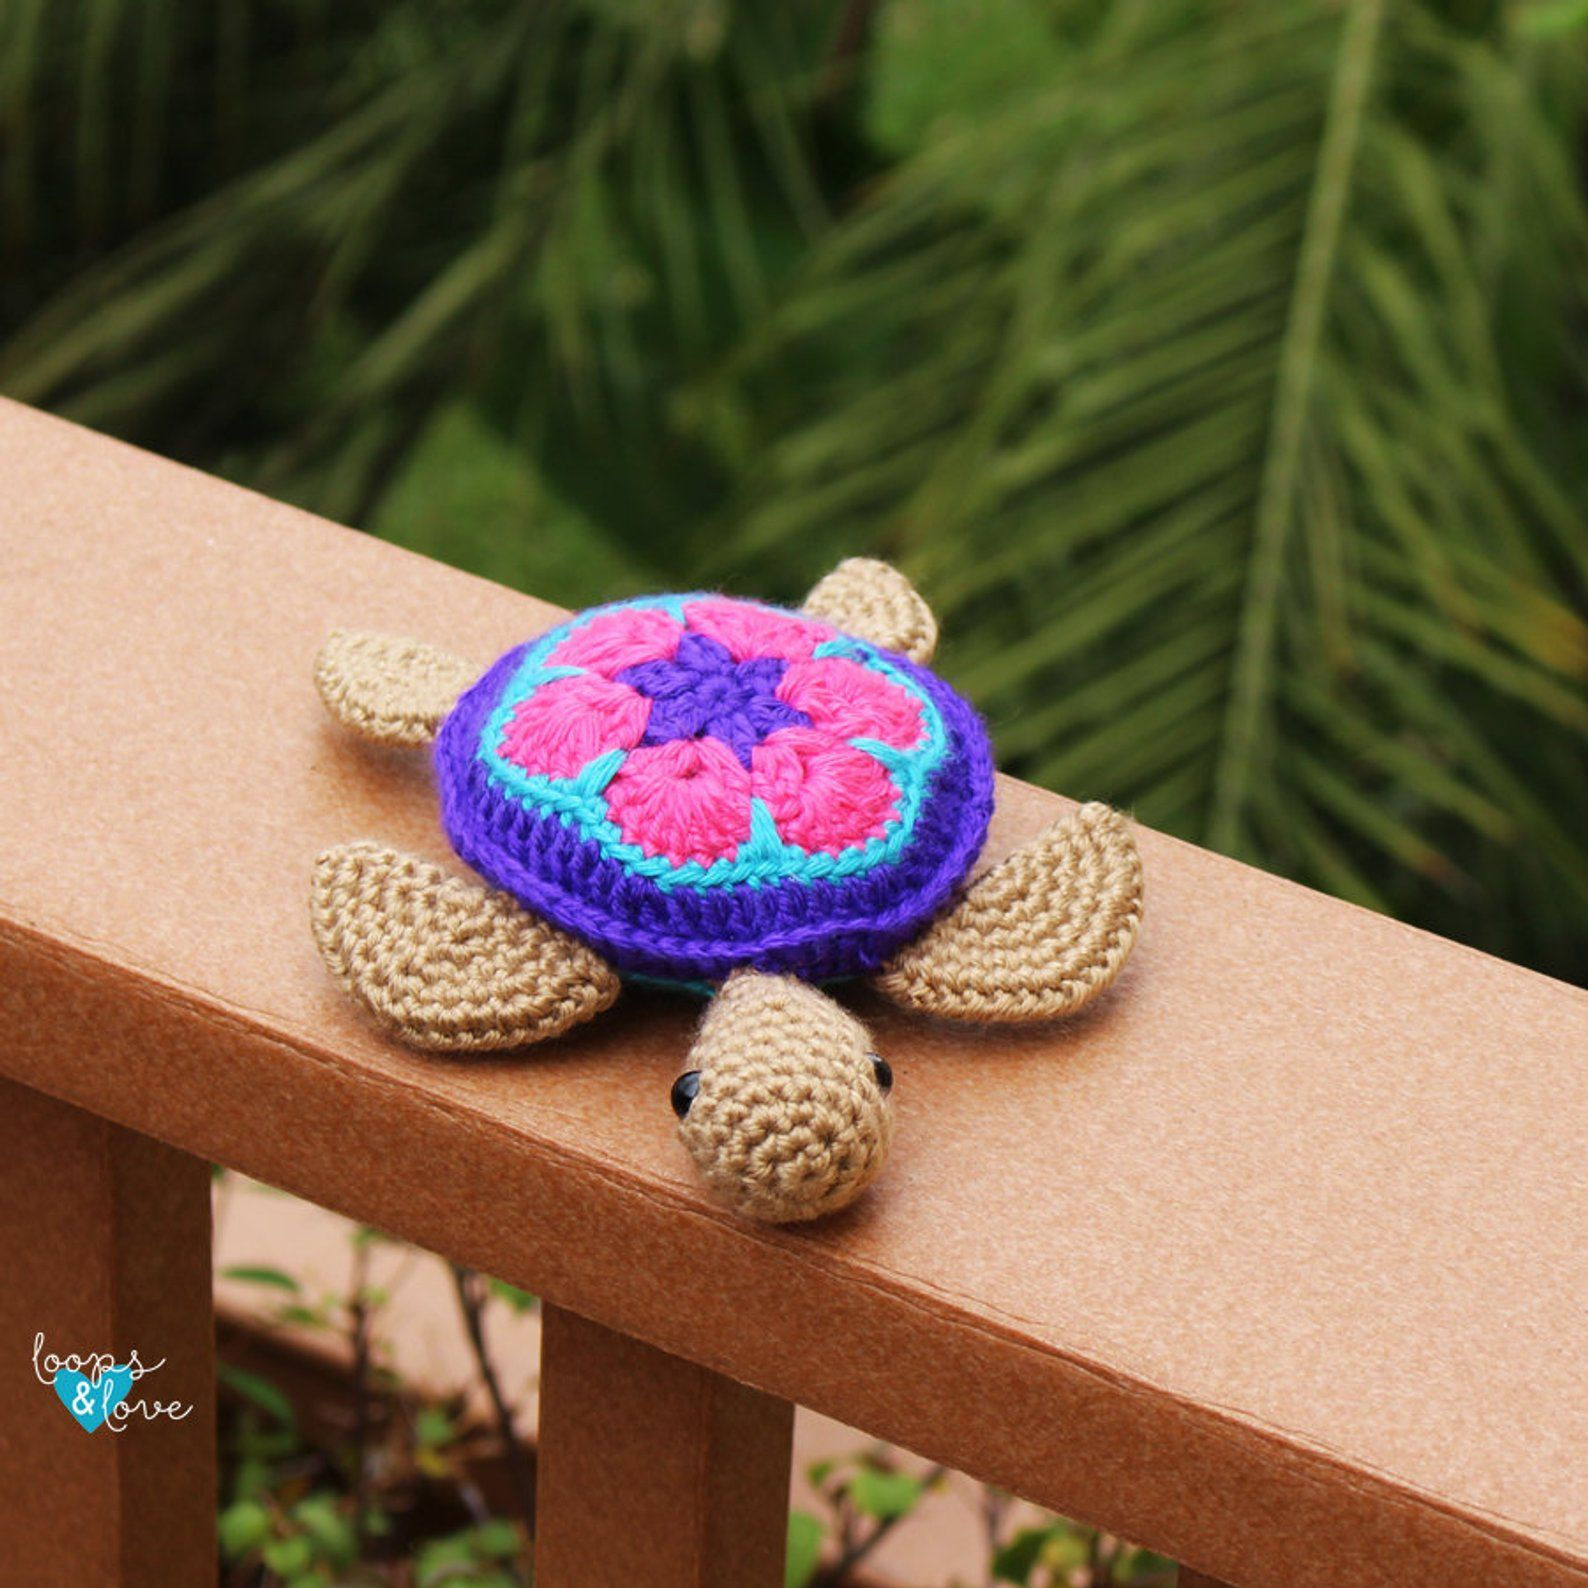 Crochet Sea Turtle   Crochet Turtle   Turtle Crochet Pattern   Turtle Amigurumi   Sea Turtle Crochet Pattern   Crochet Animals   Crochet Toy #crochetturtles